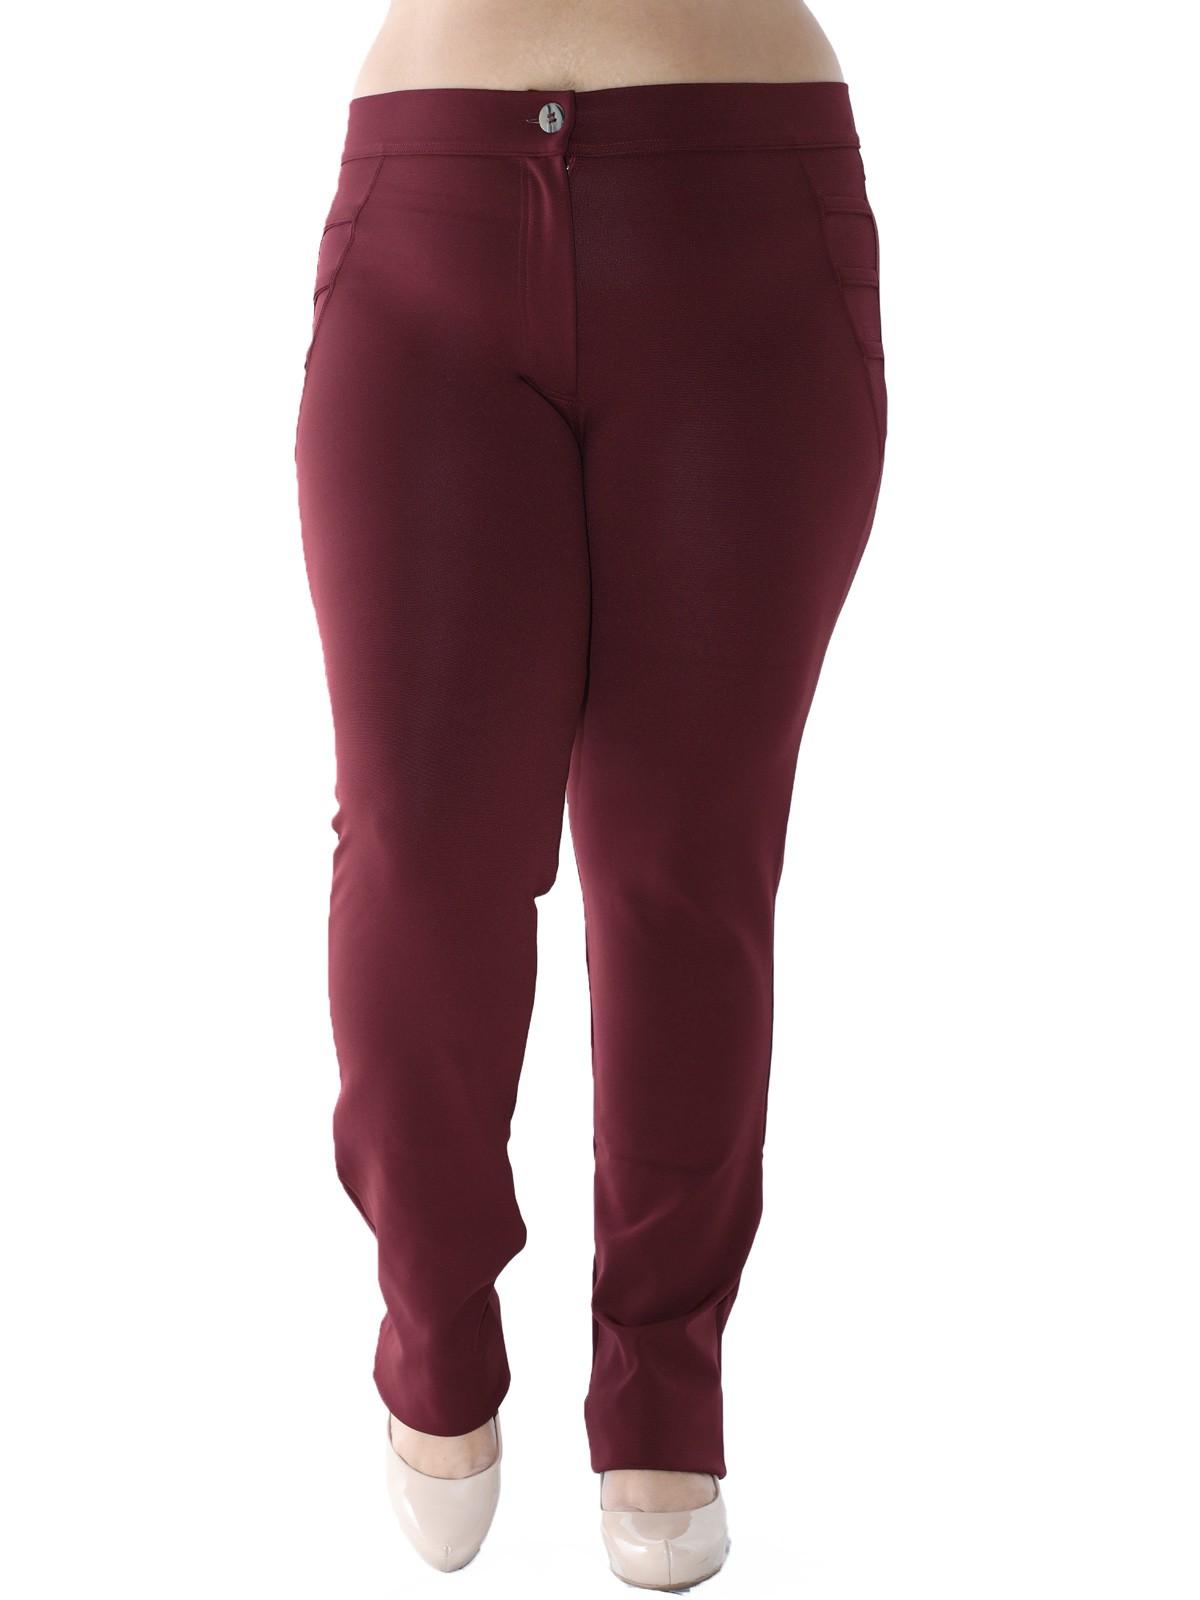 Calça Plus Size Detalhe Lateral Body Fit Bordo